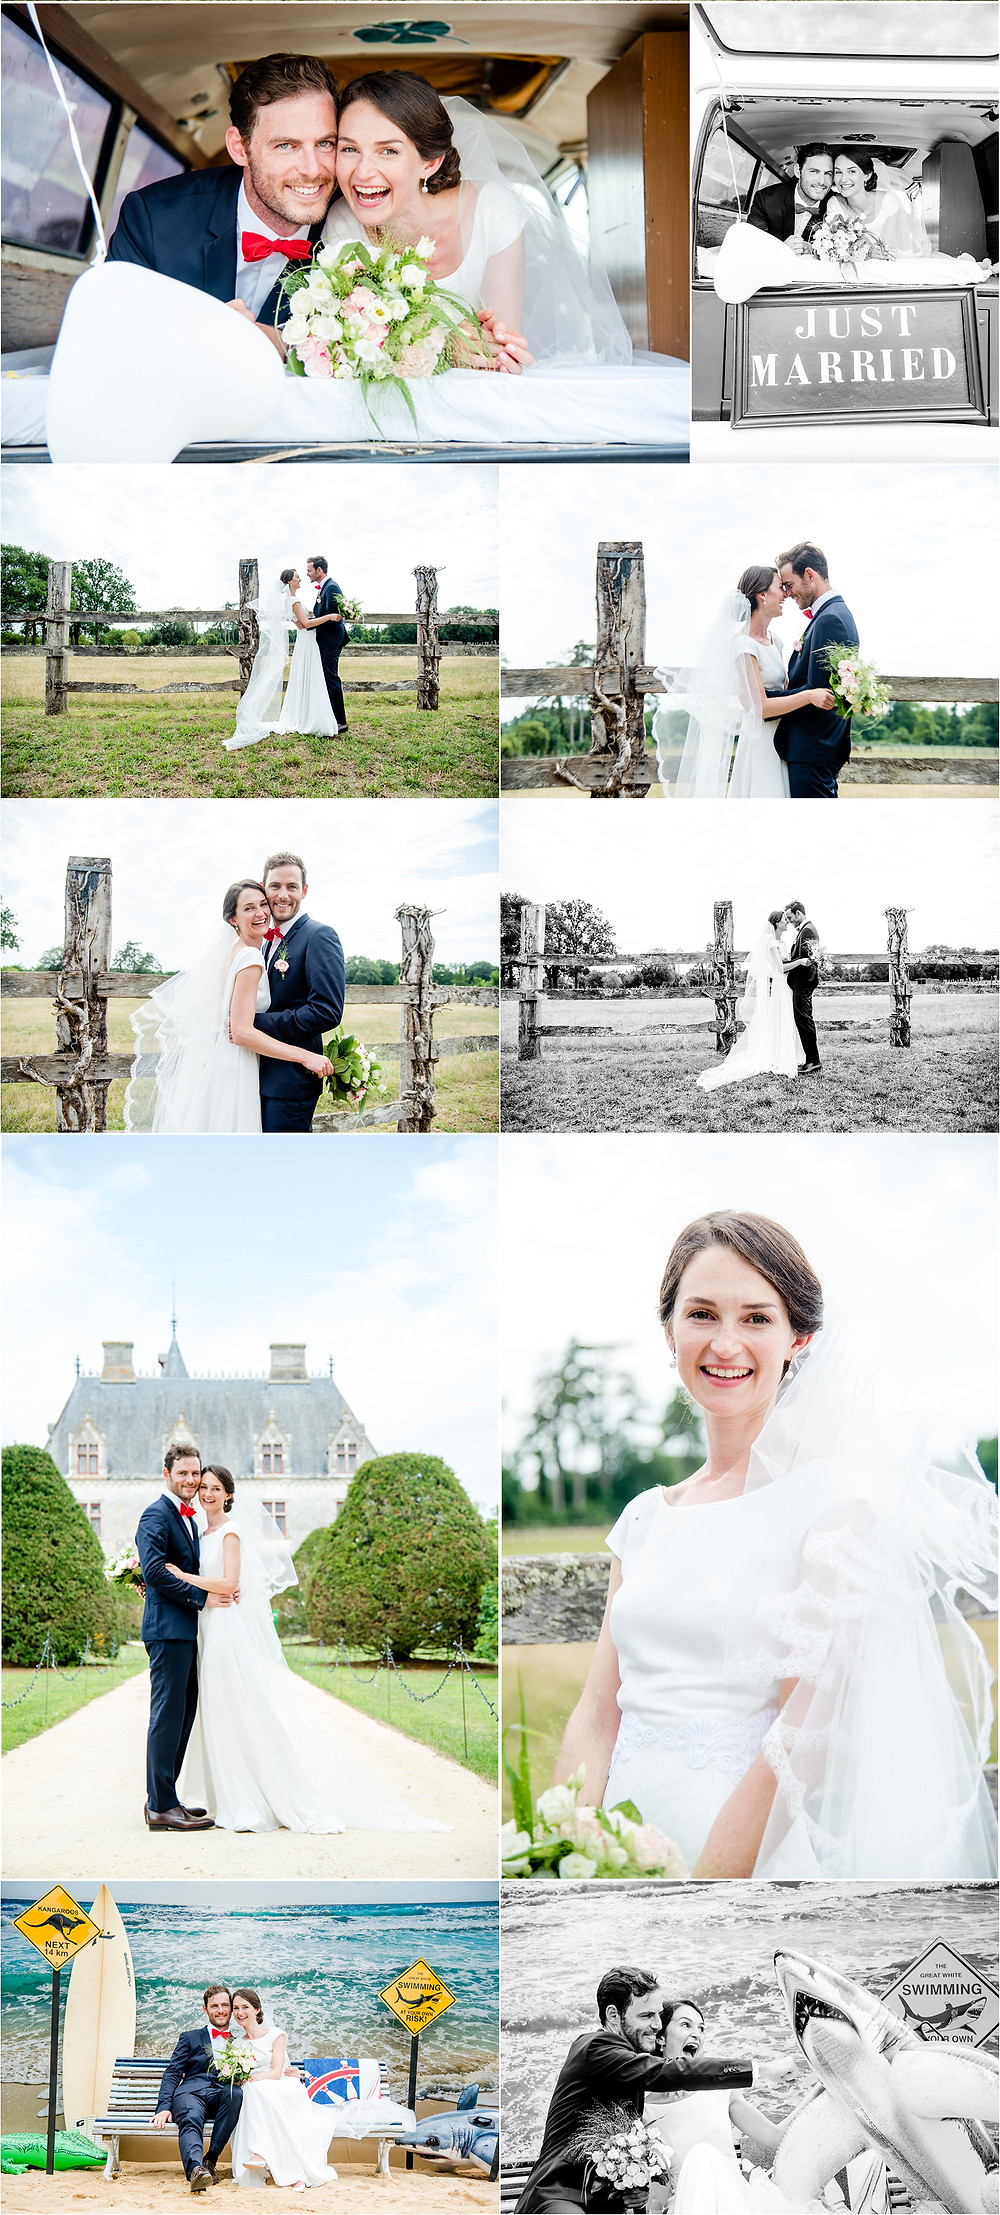 Mariage en charente - photos couple - Brigitte Delibes Photographie - Photographe Mariage Nantes